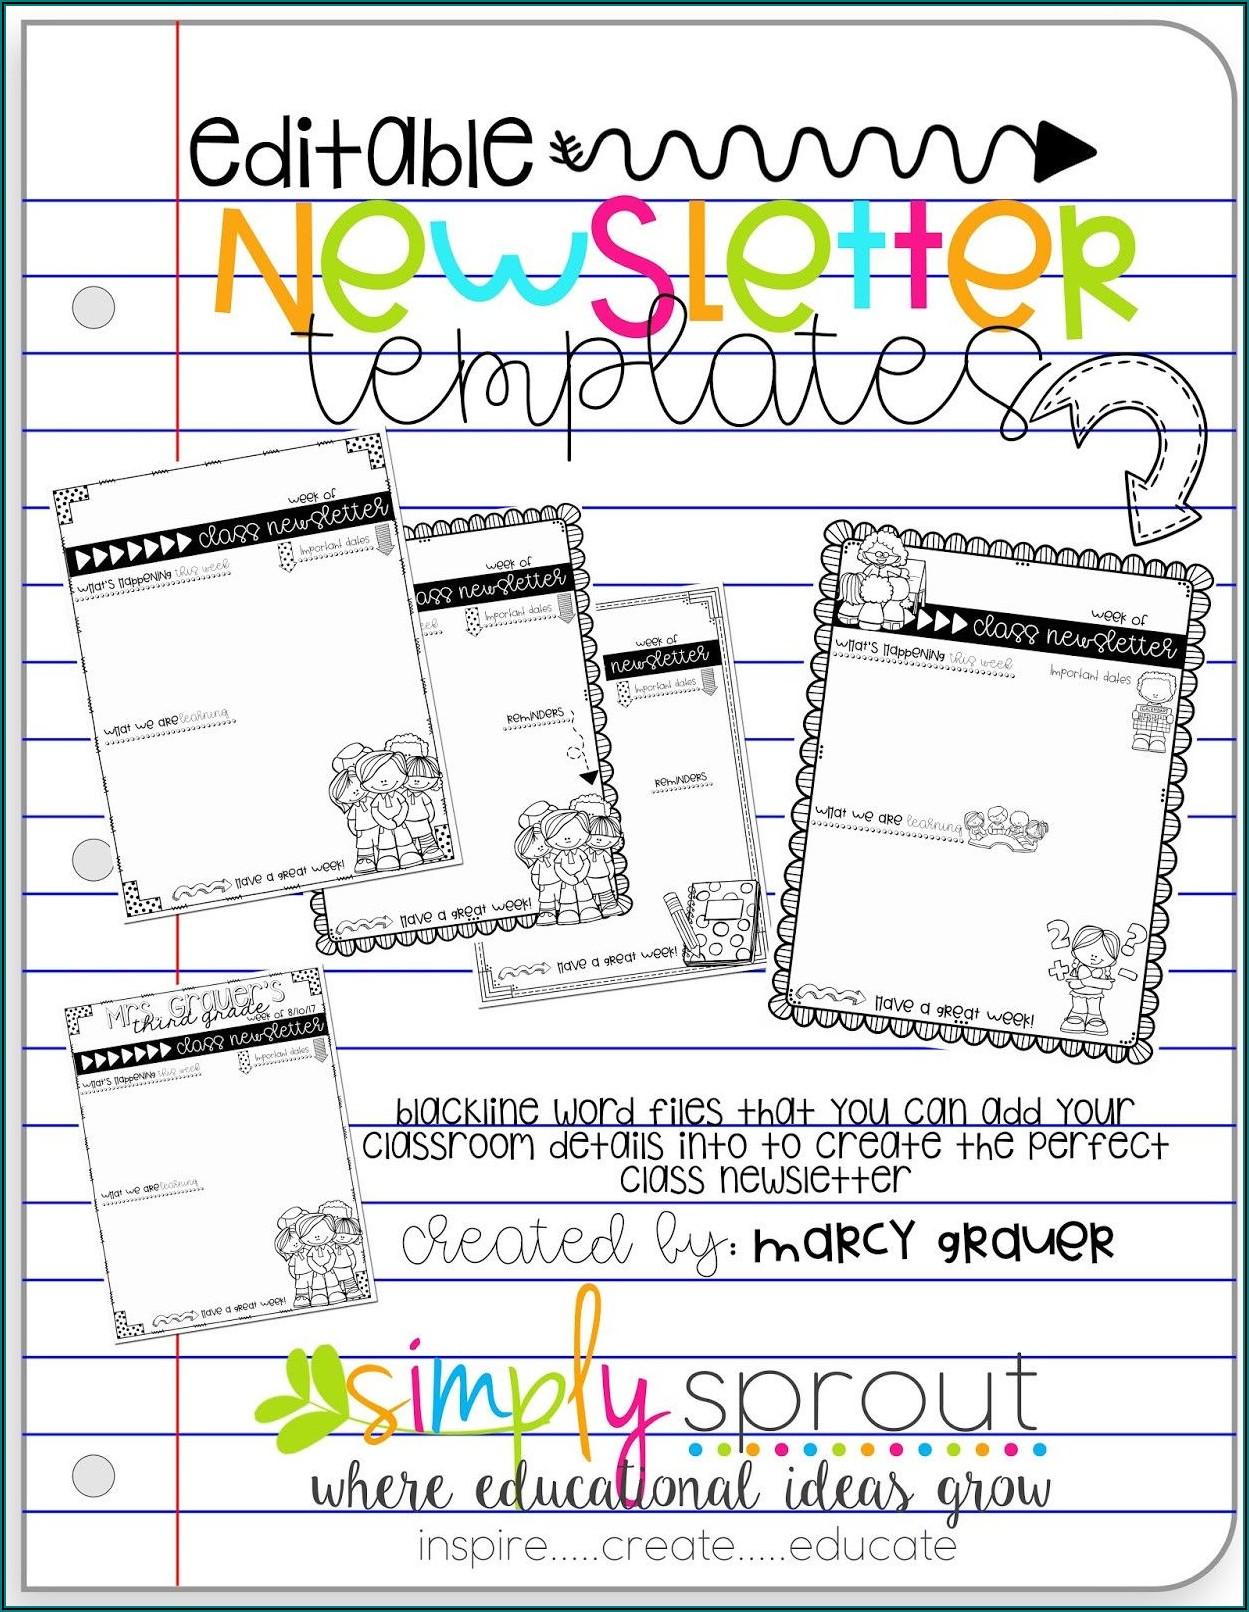 Free Editable Elementary School Newsletter Templates